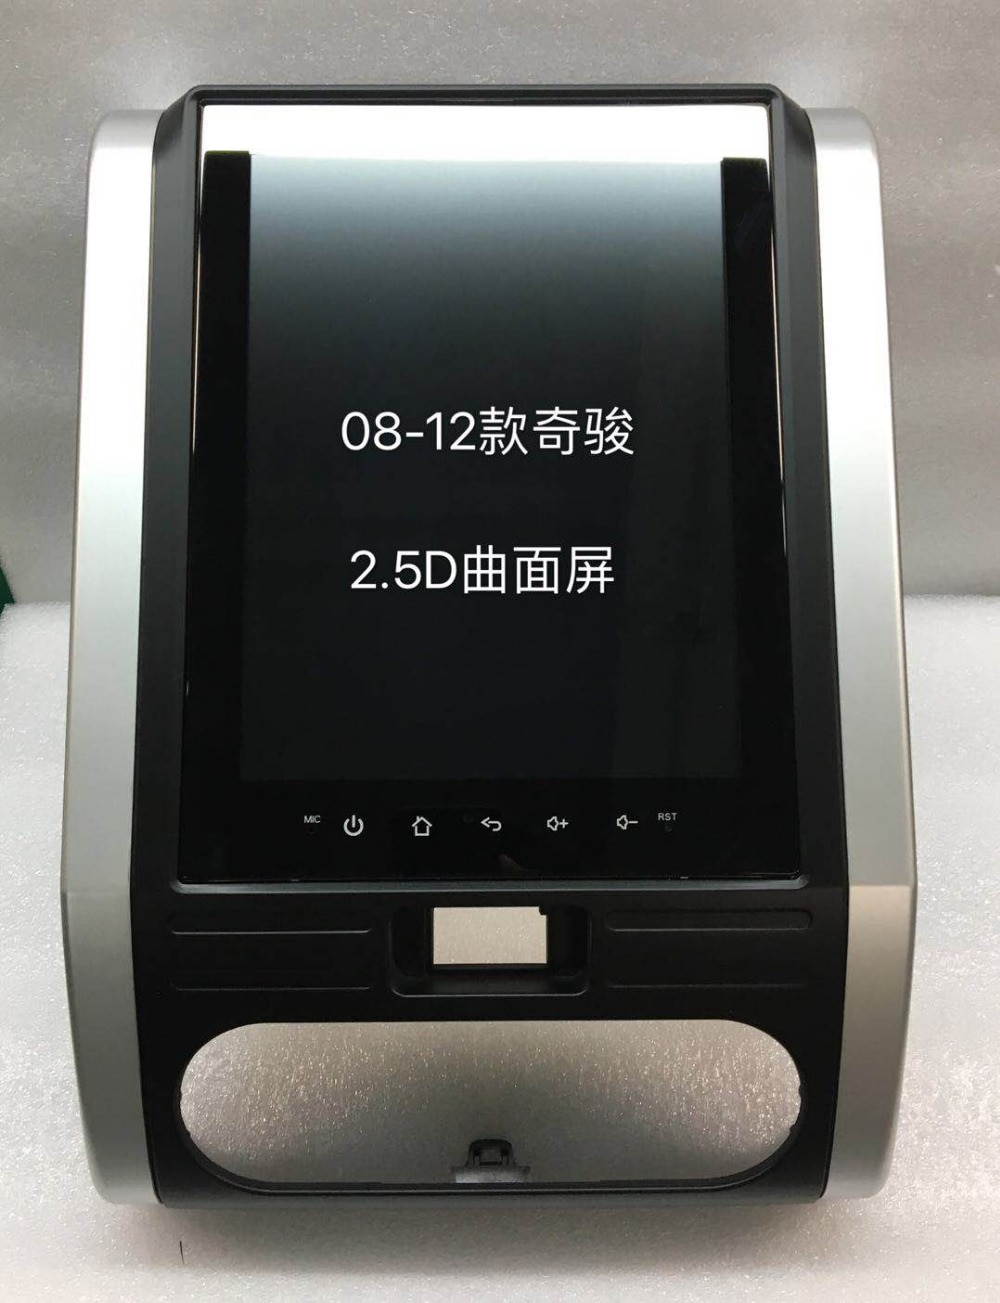 Reproductor multimedia de coche Chogath con pantalla vertical de 10,4 pulgadas, Radio de coche quad core, reproductor de navegador GPS para x-trail 2008-2012 wtih usb